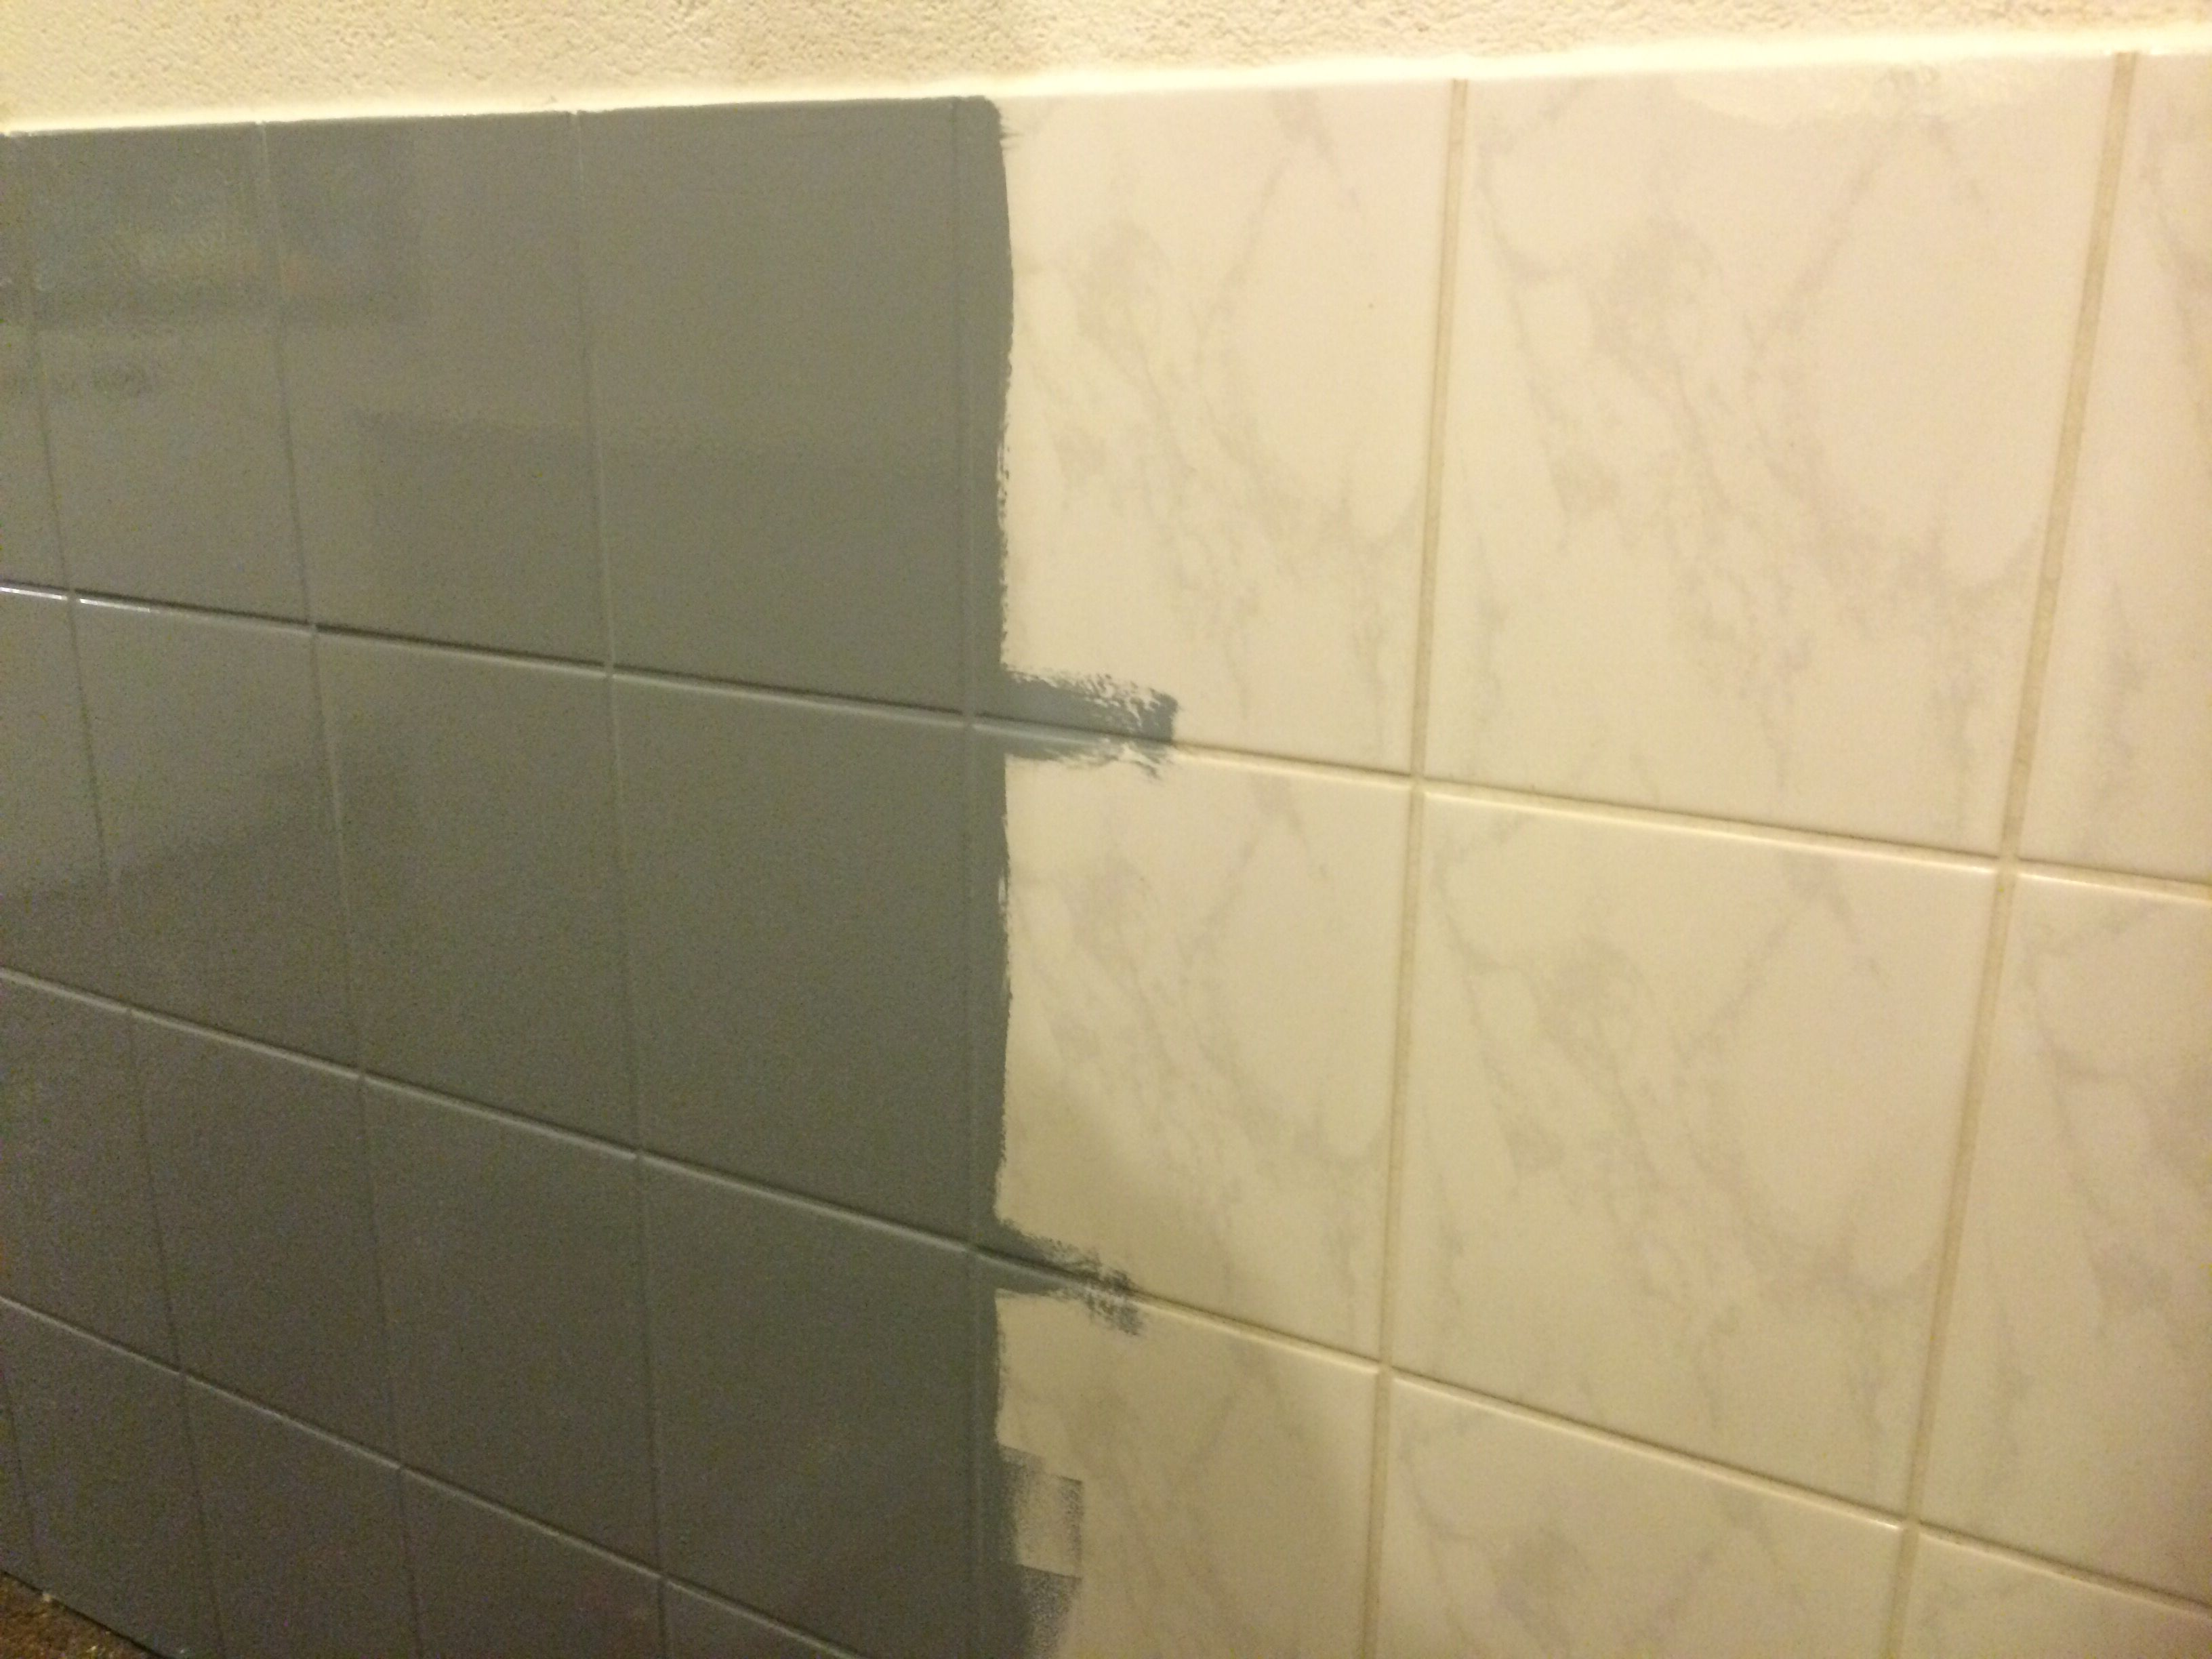 Plavuizen Over Plavuizen.Pimp Je Tegels Met Tegelverf Keuken Over Toilet Attic